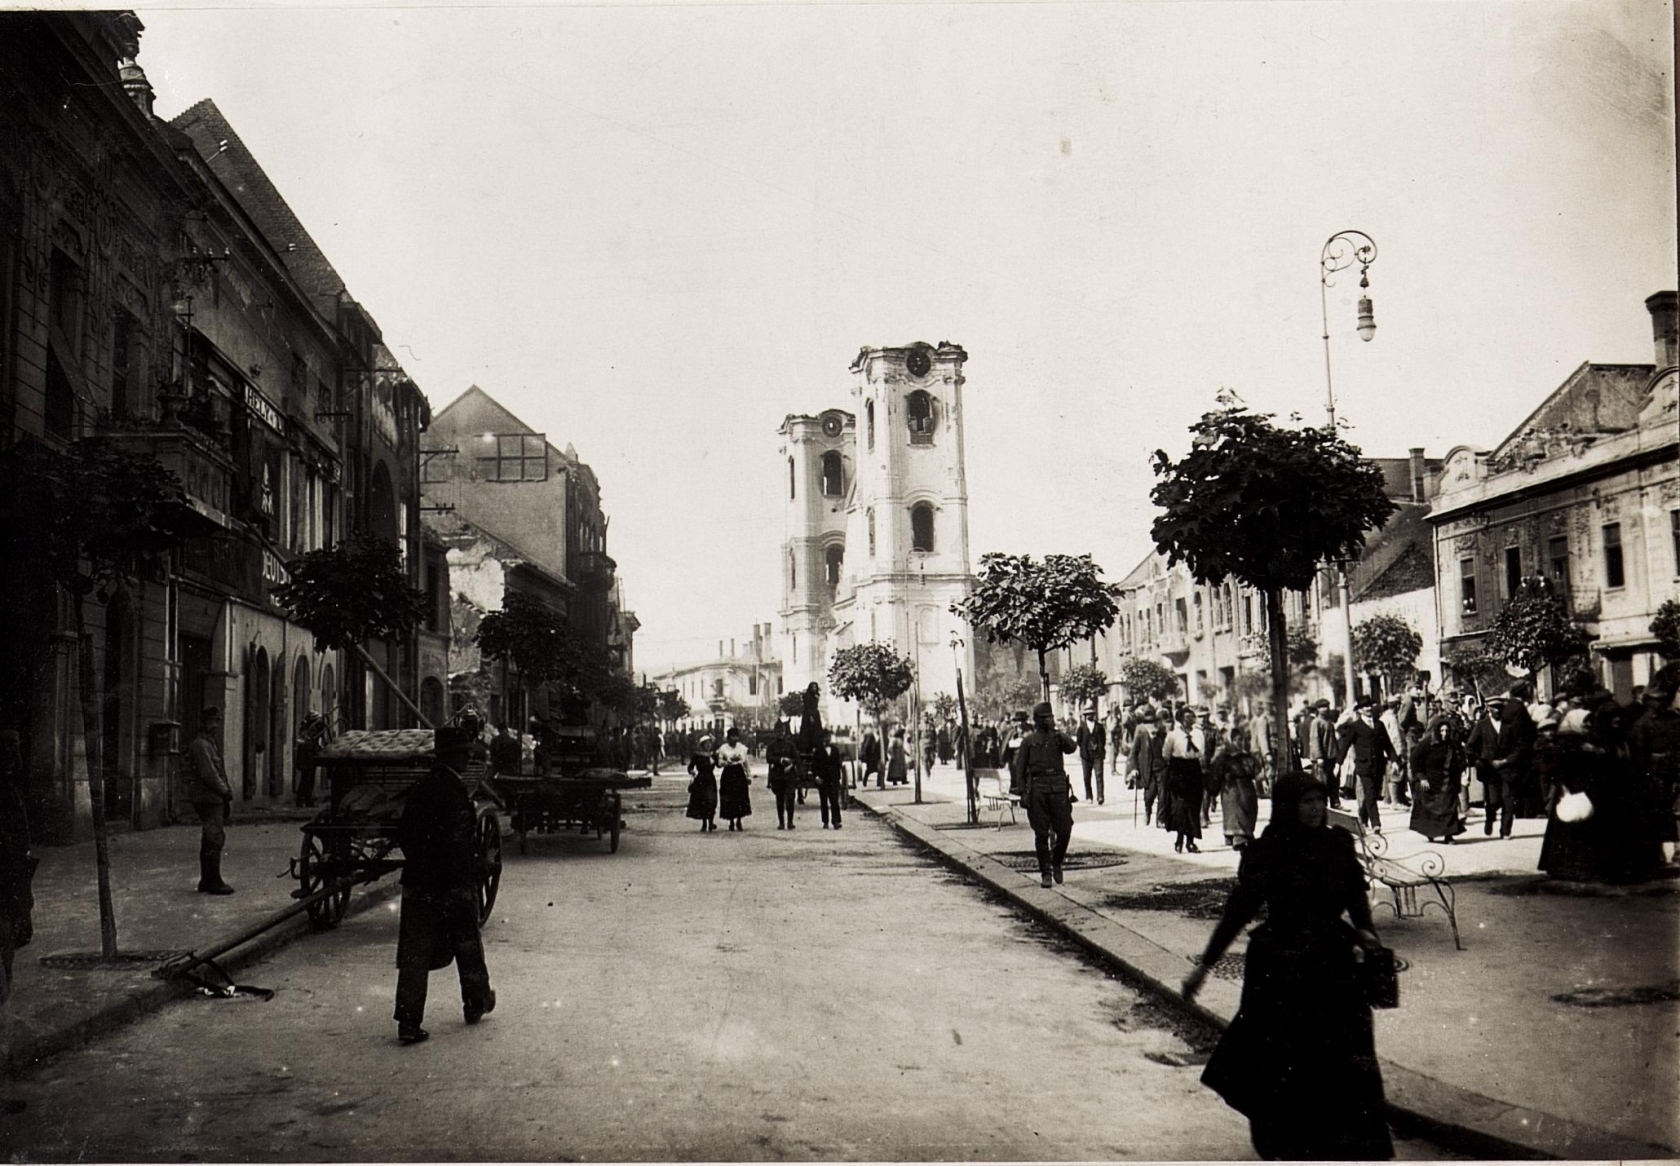 2 nappal a tűzvész után, az 1917. május 23-i helyzet. Kép: K.u.k. Kriegspressequartier, Lichtbildstelle - Wien - https://www.bildarchivaustria.at / Wikimedia Commons